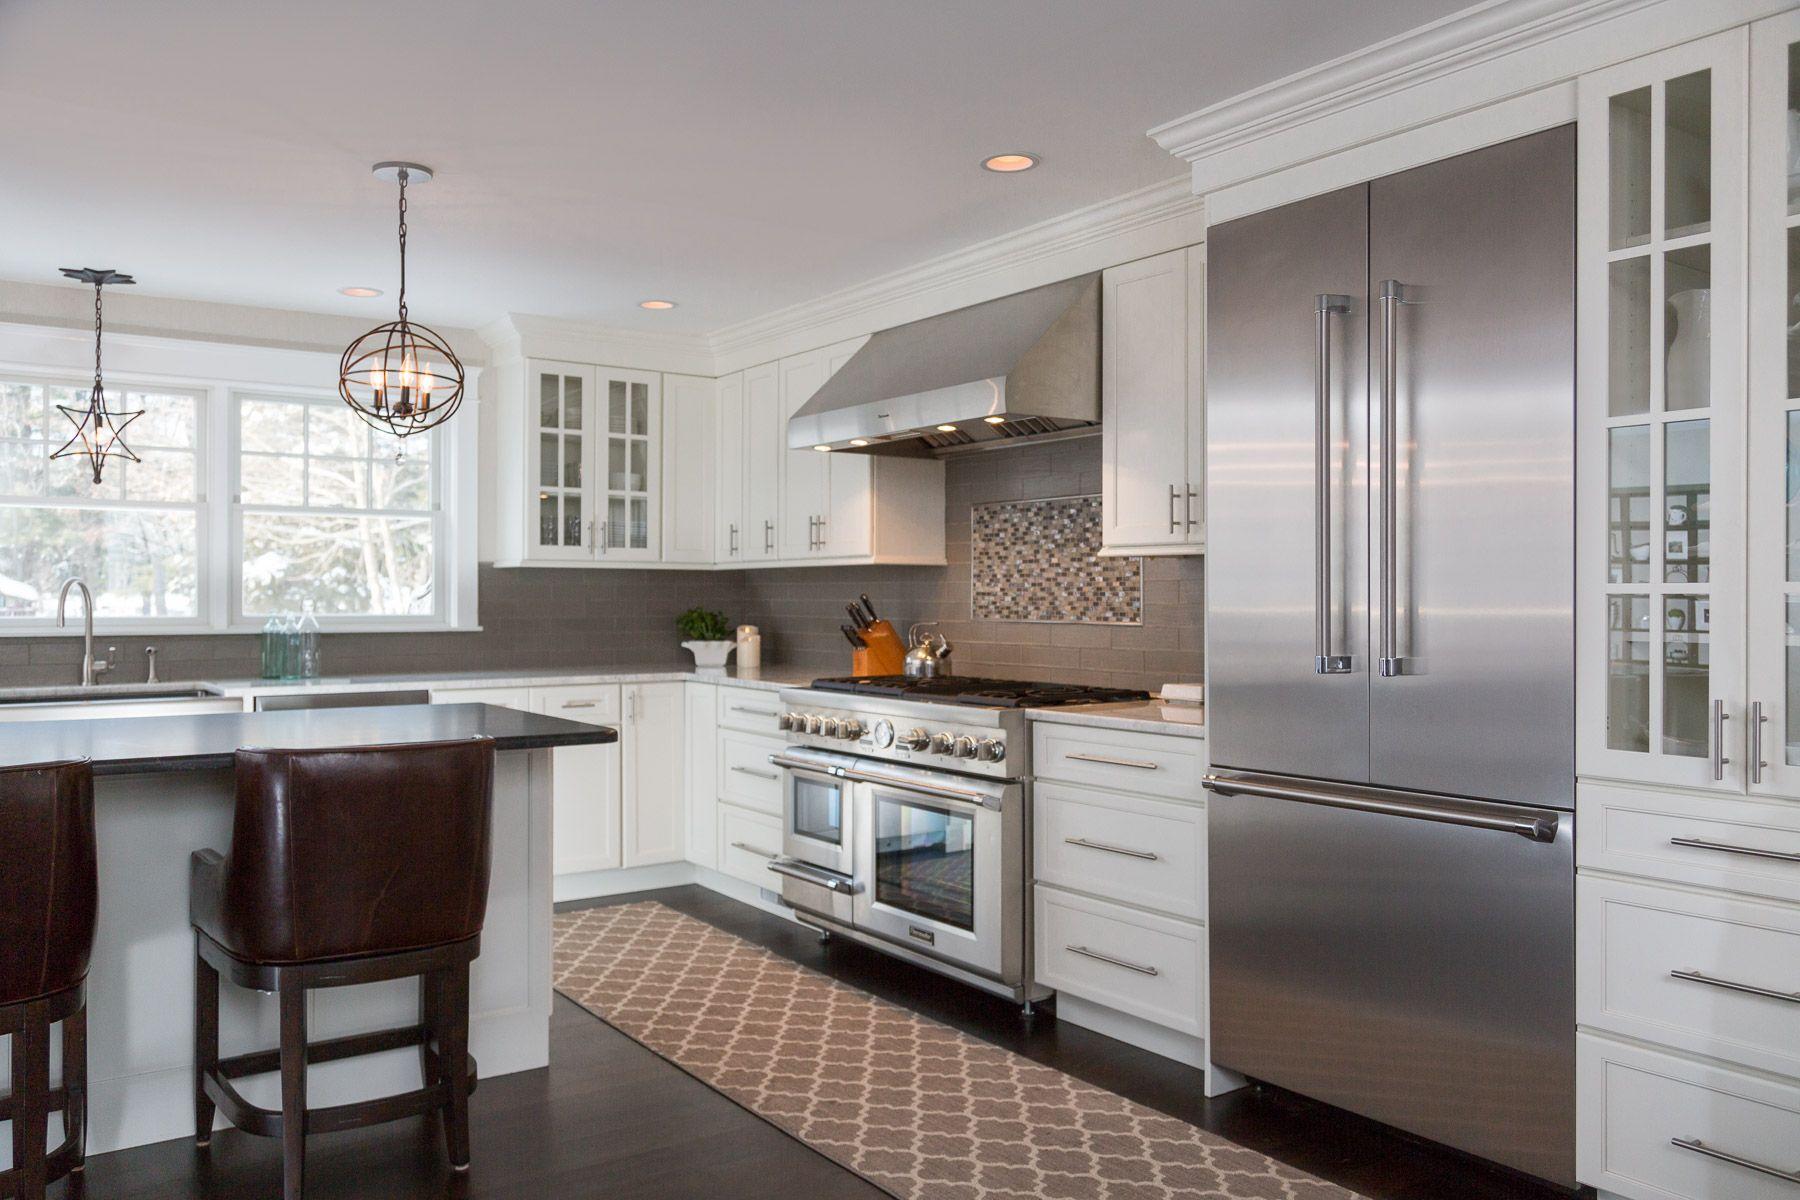 Transitional Style Transitional Kitchen Large Kitchen Island Upper Cabinets